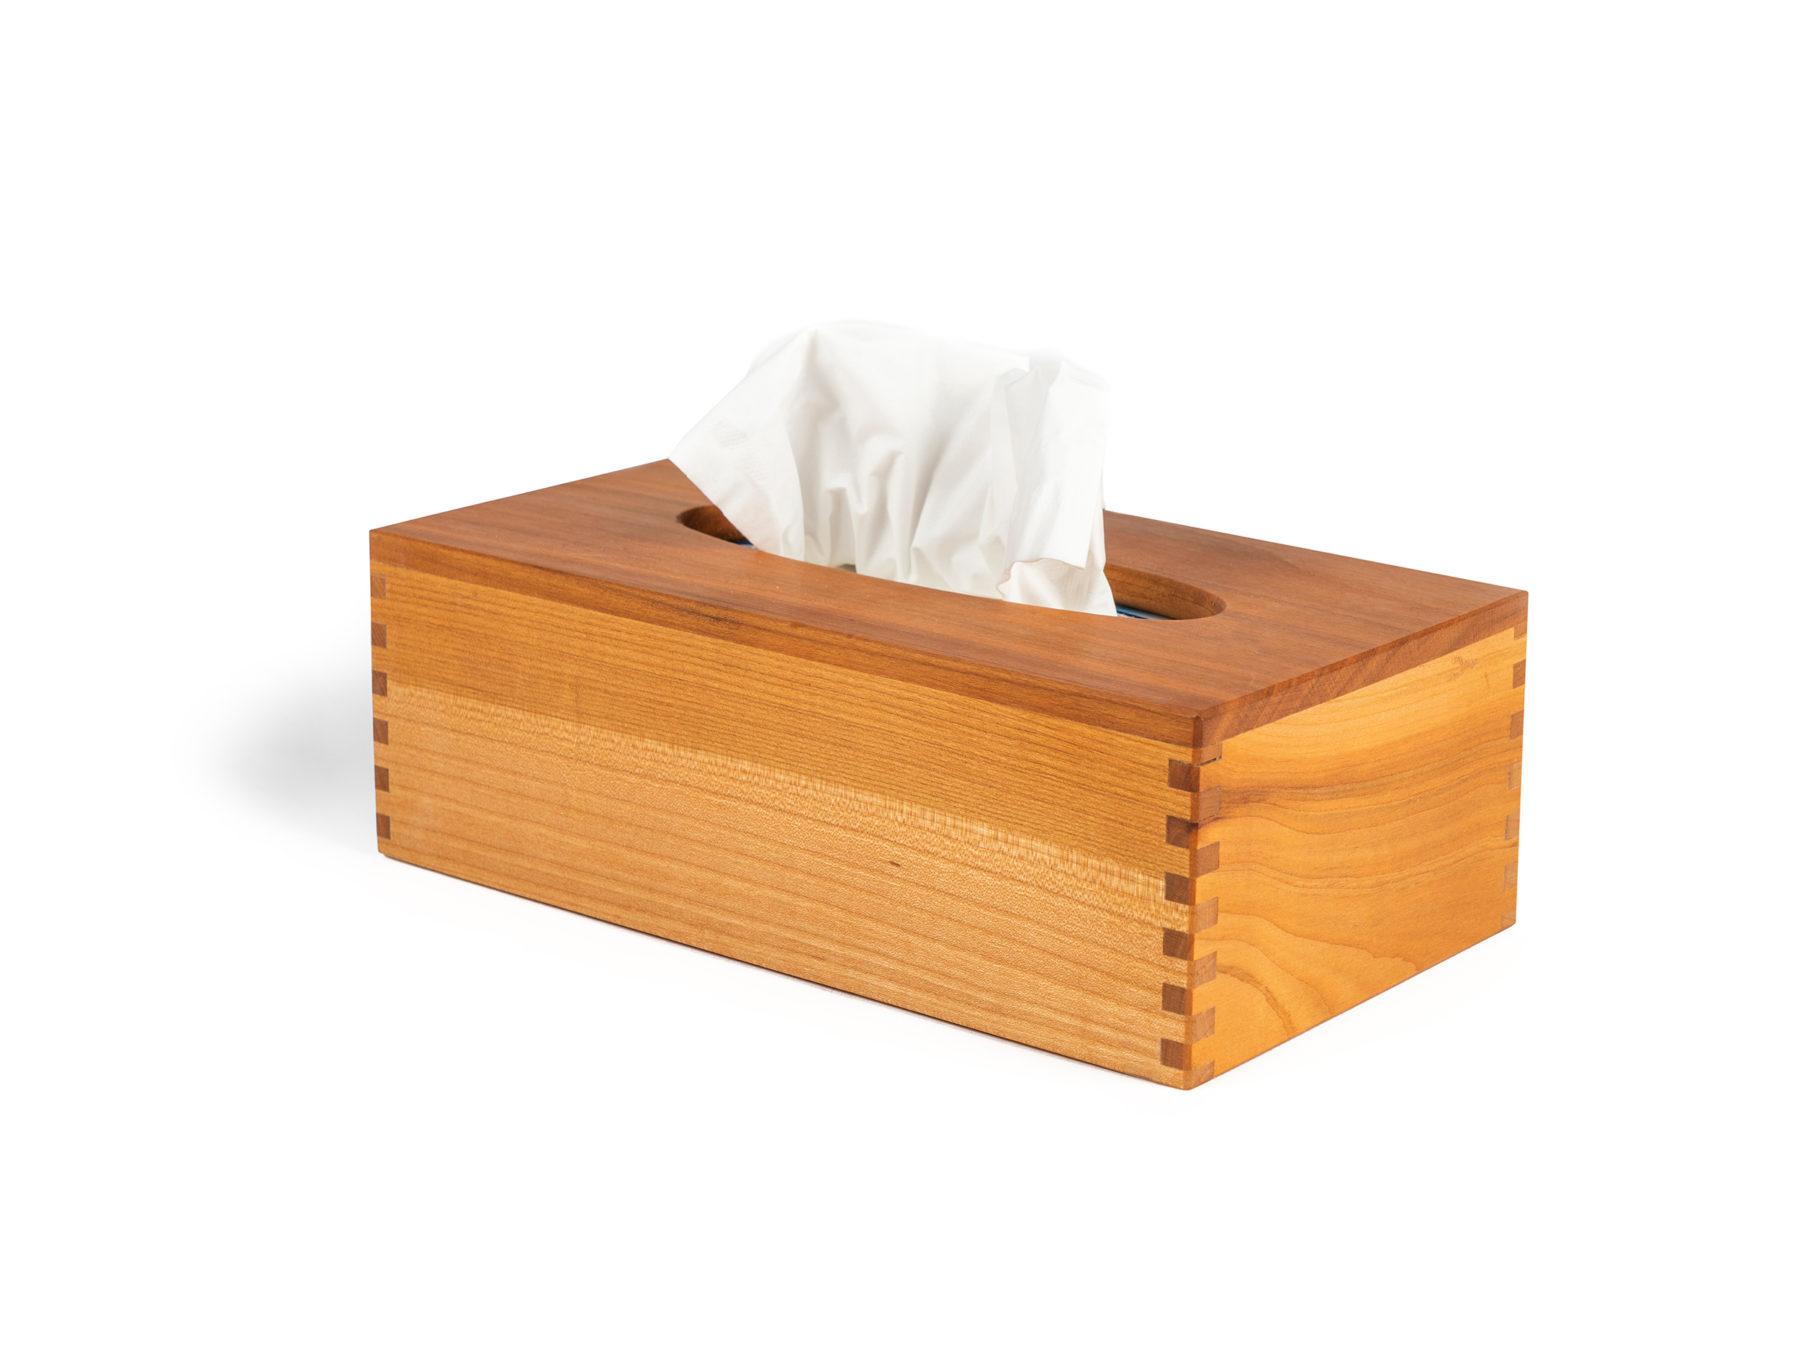 Kosmetituecher Box Holz Schweiz Kleenex swissmade KURTS.ch